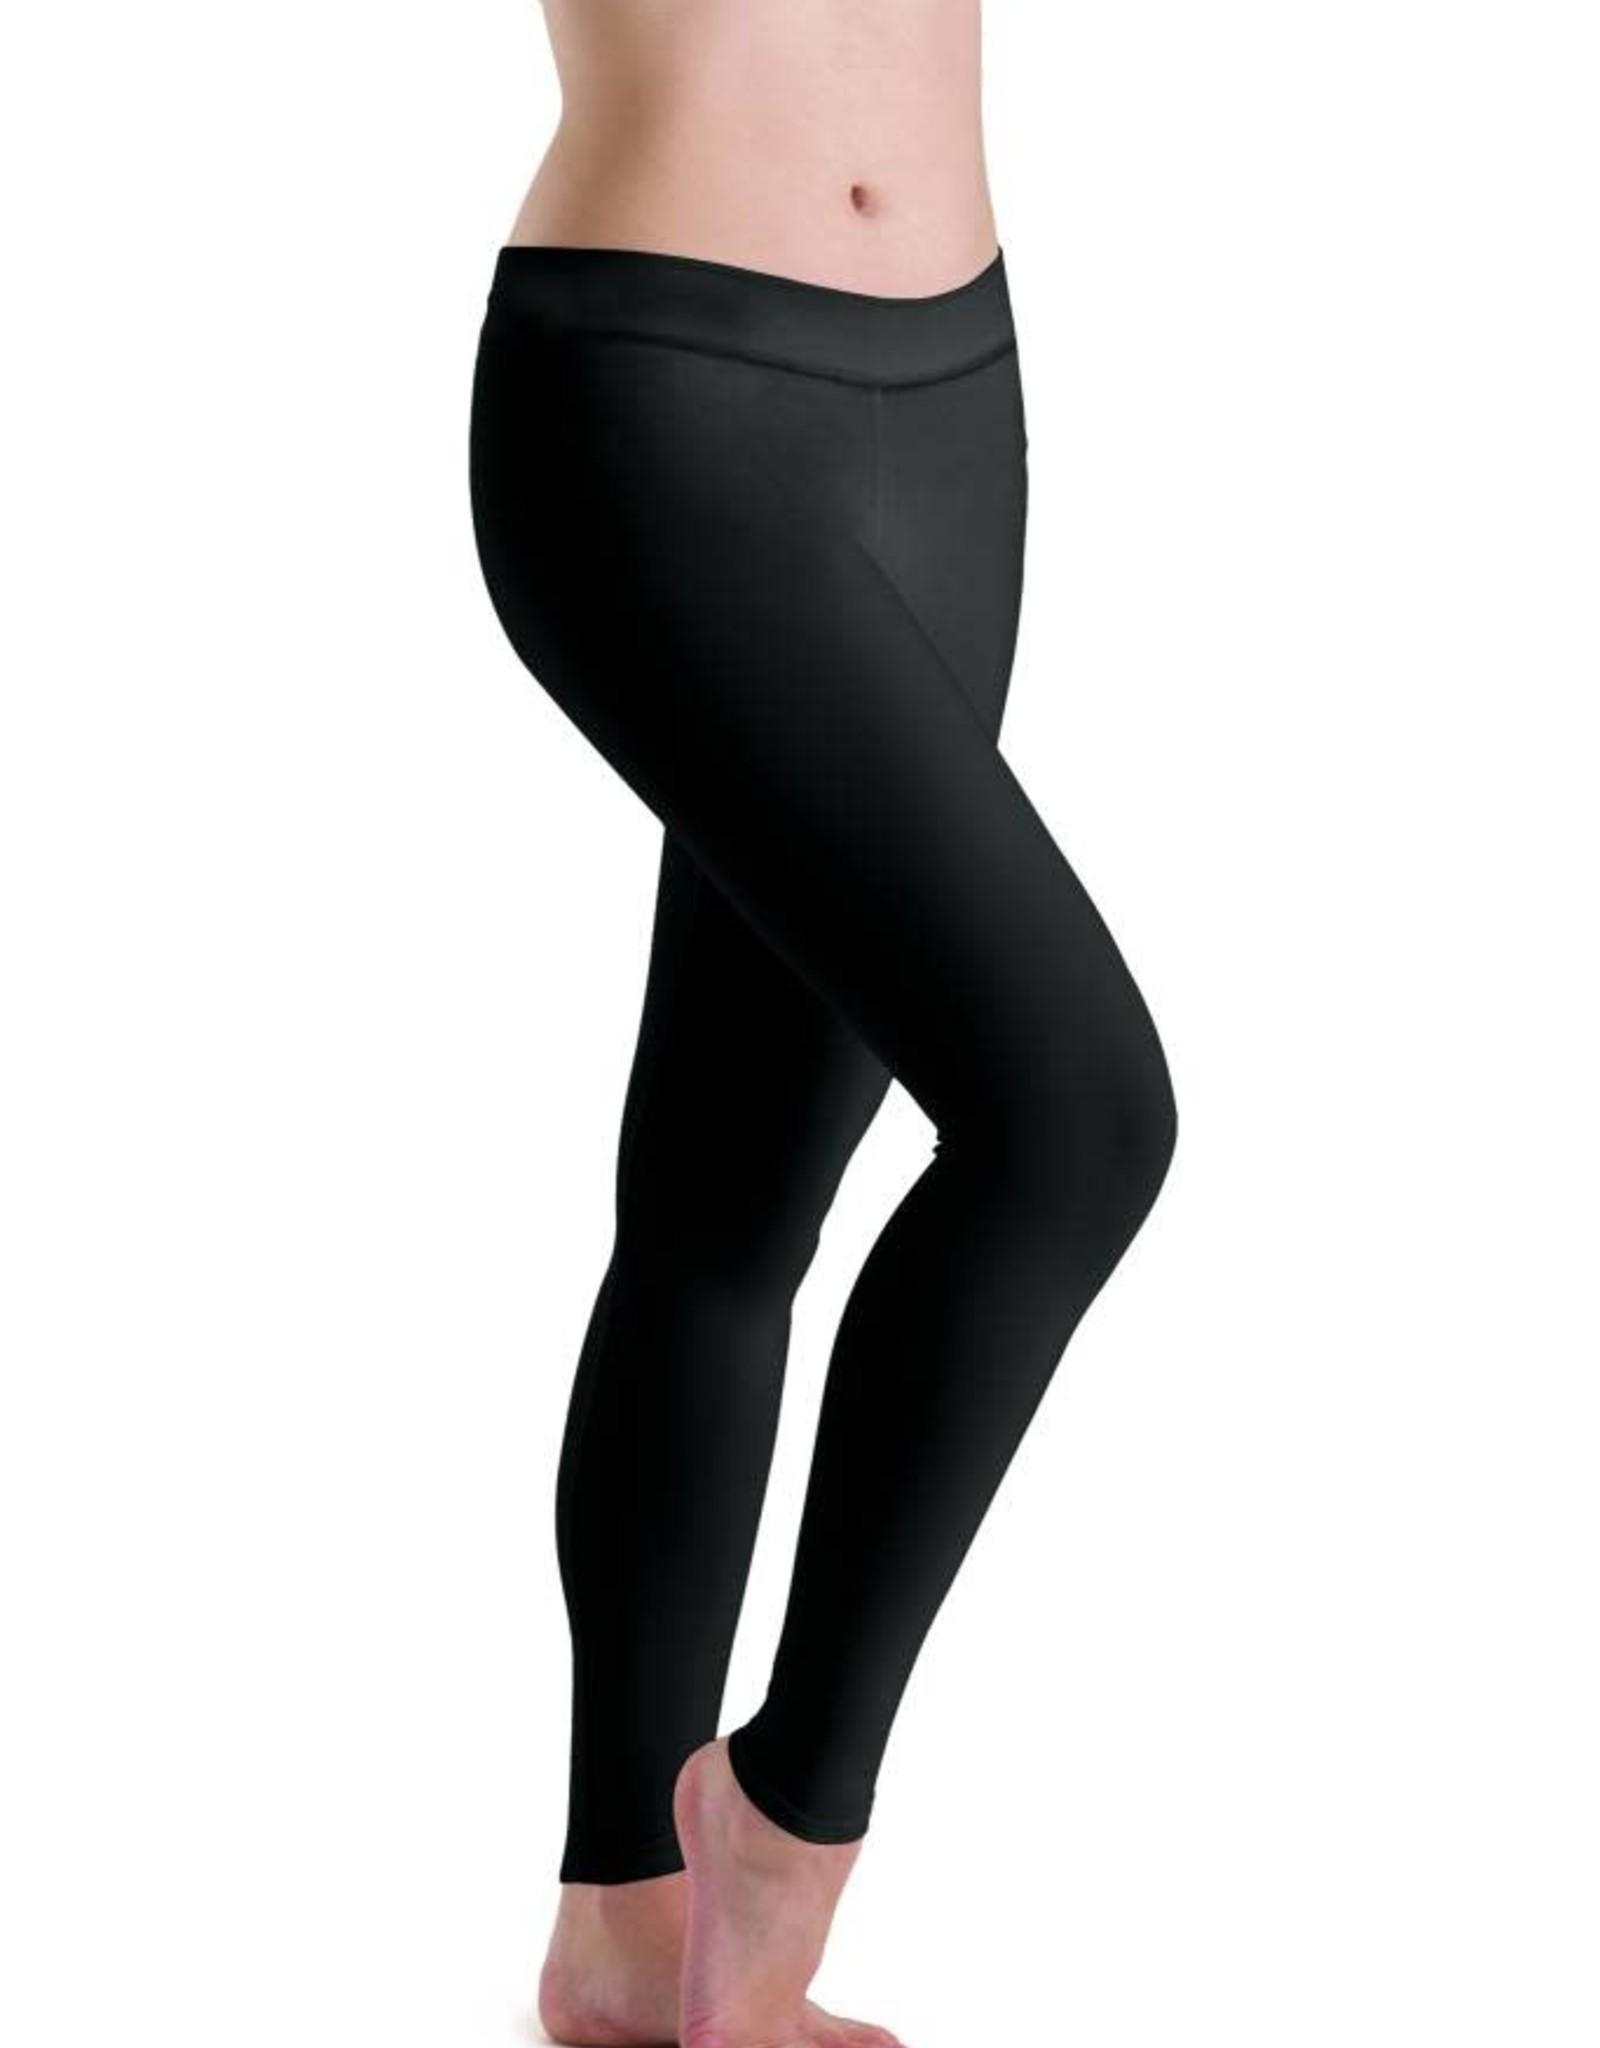 Motionwear Motionwear Flat Waist Legging Ankle Length 7129 Petite Adult Black